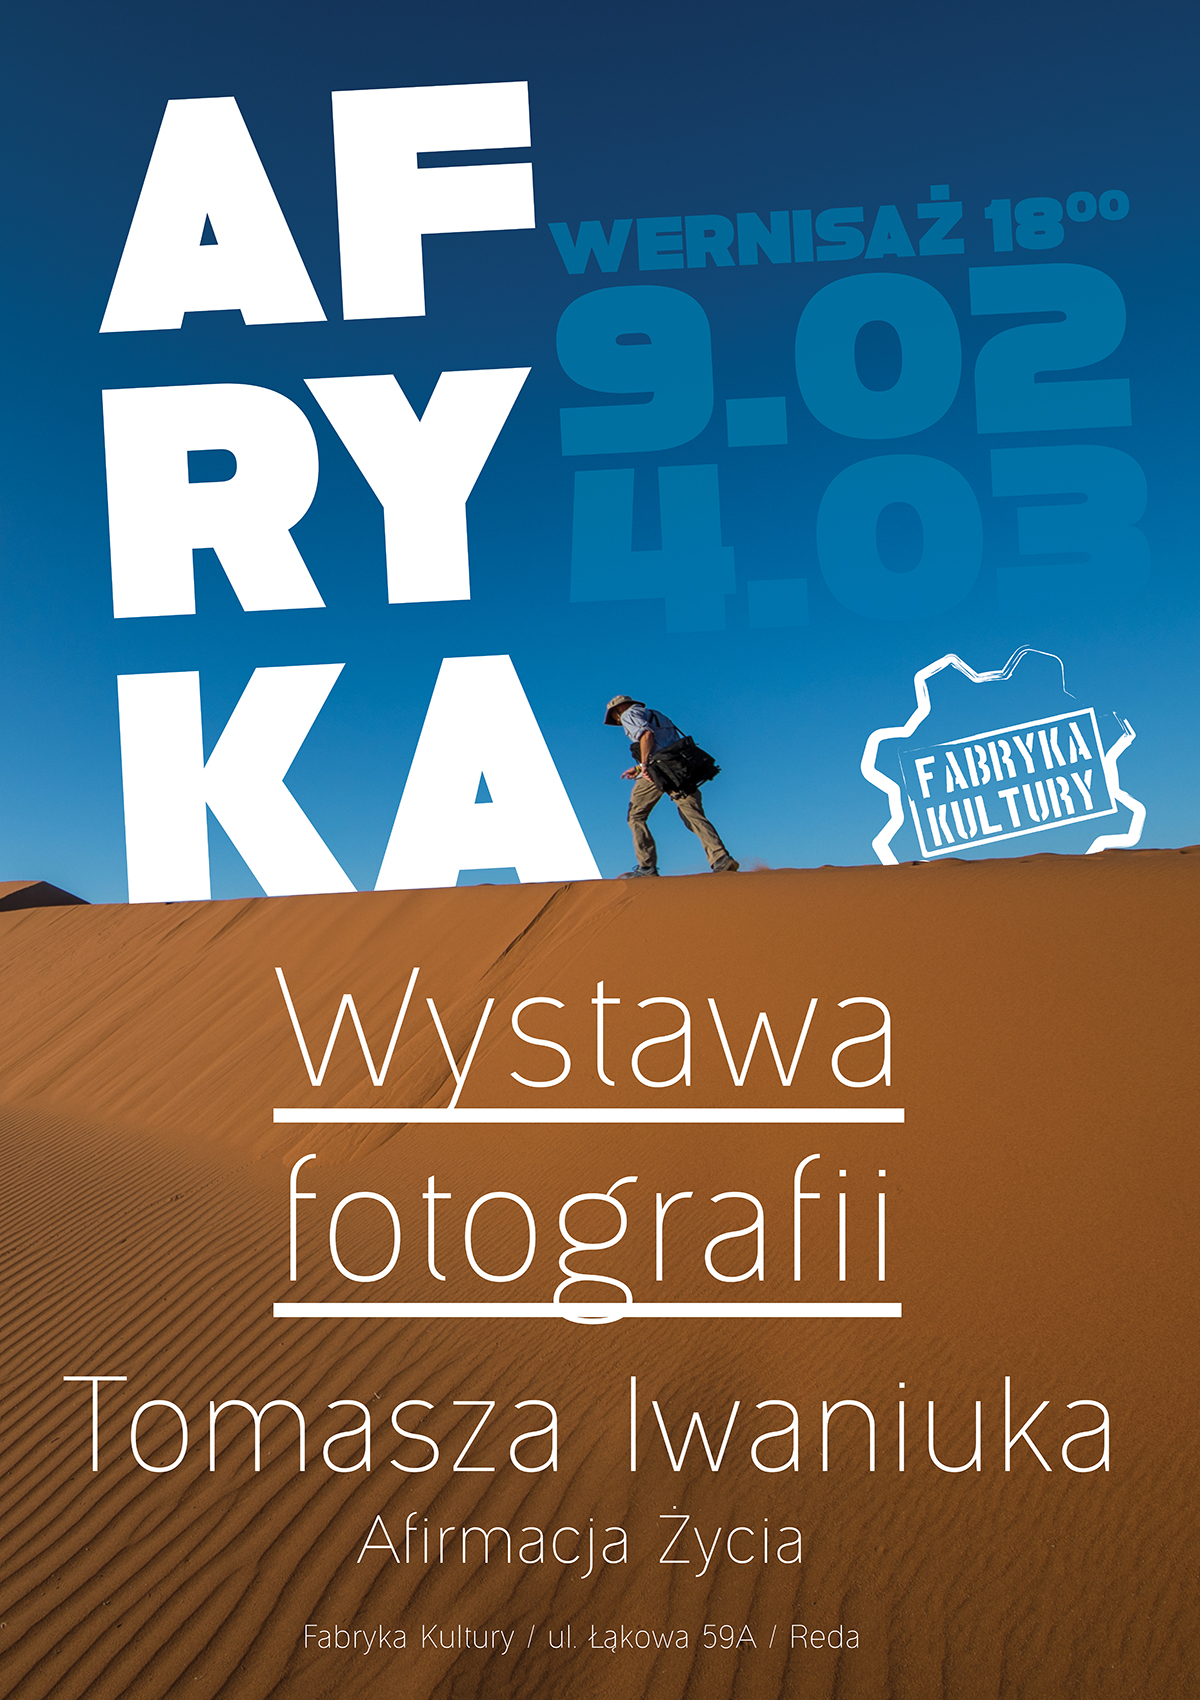 Wystawa fotografii Tomasza Iwaniuka